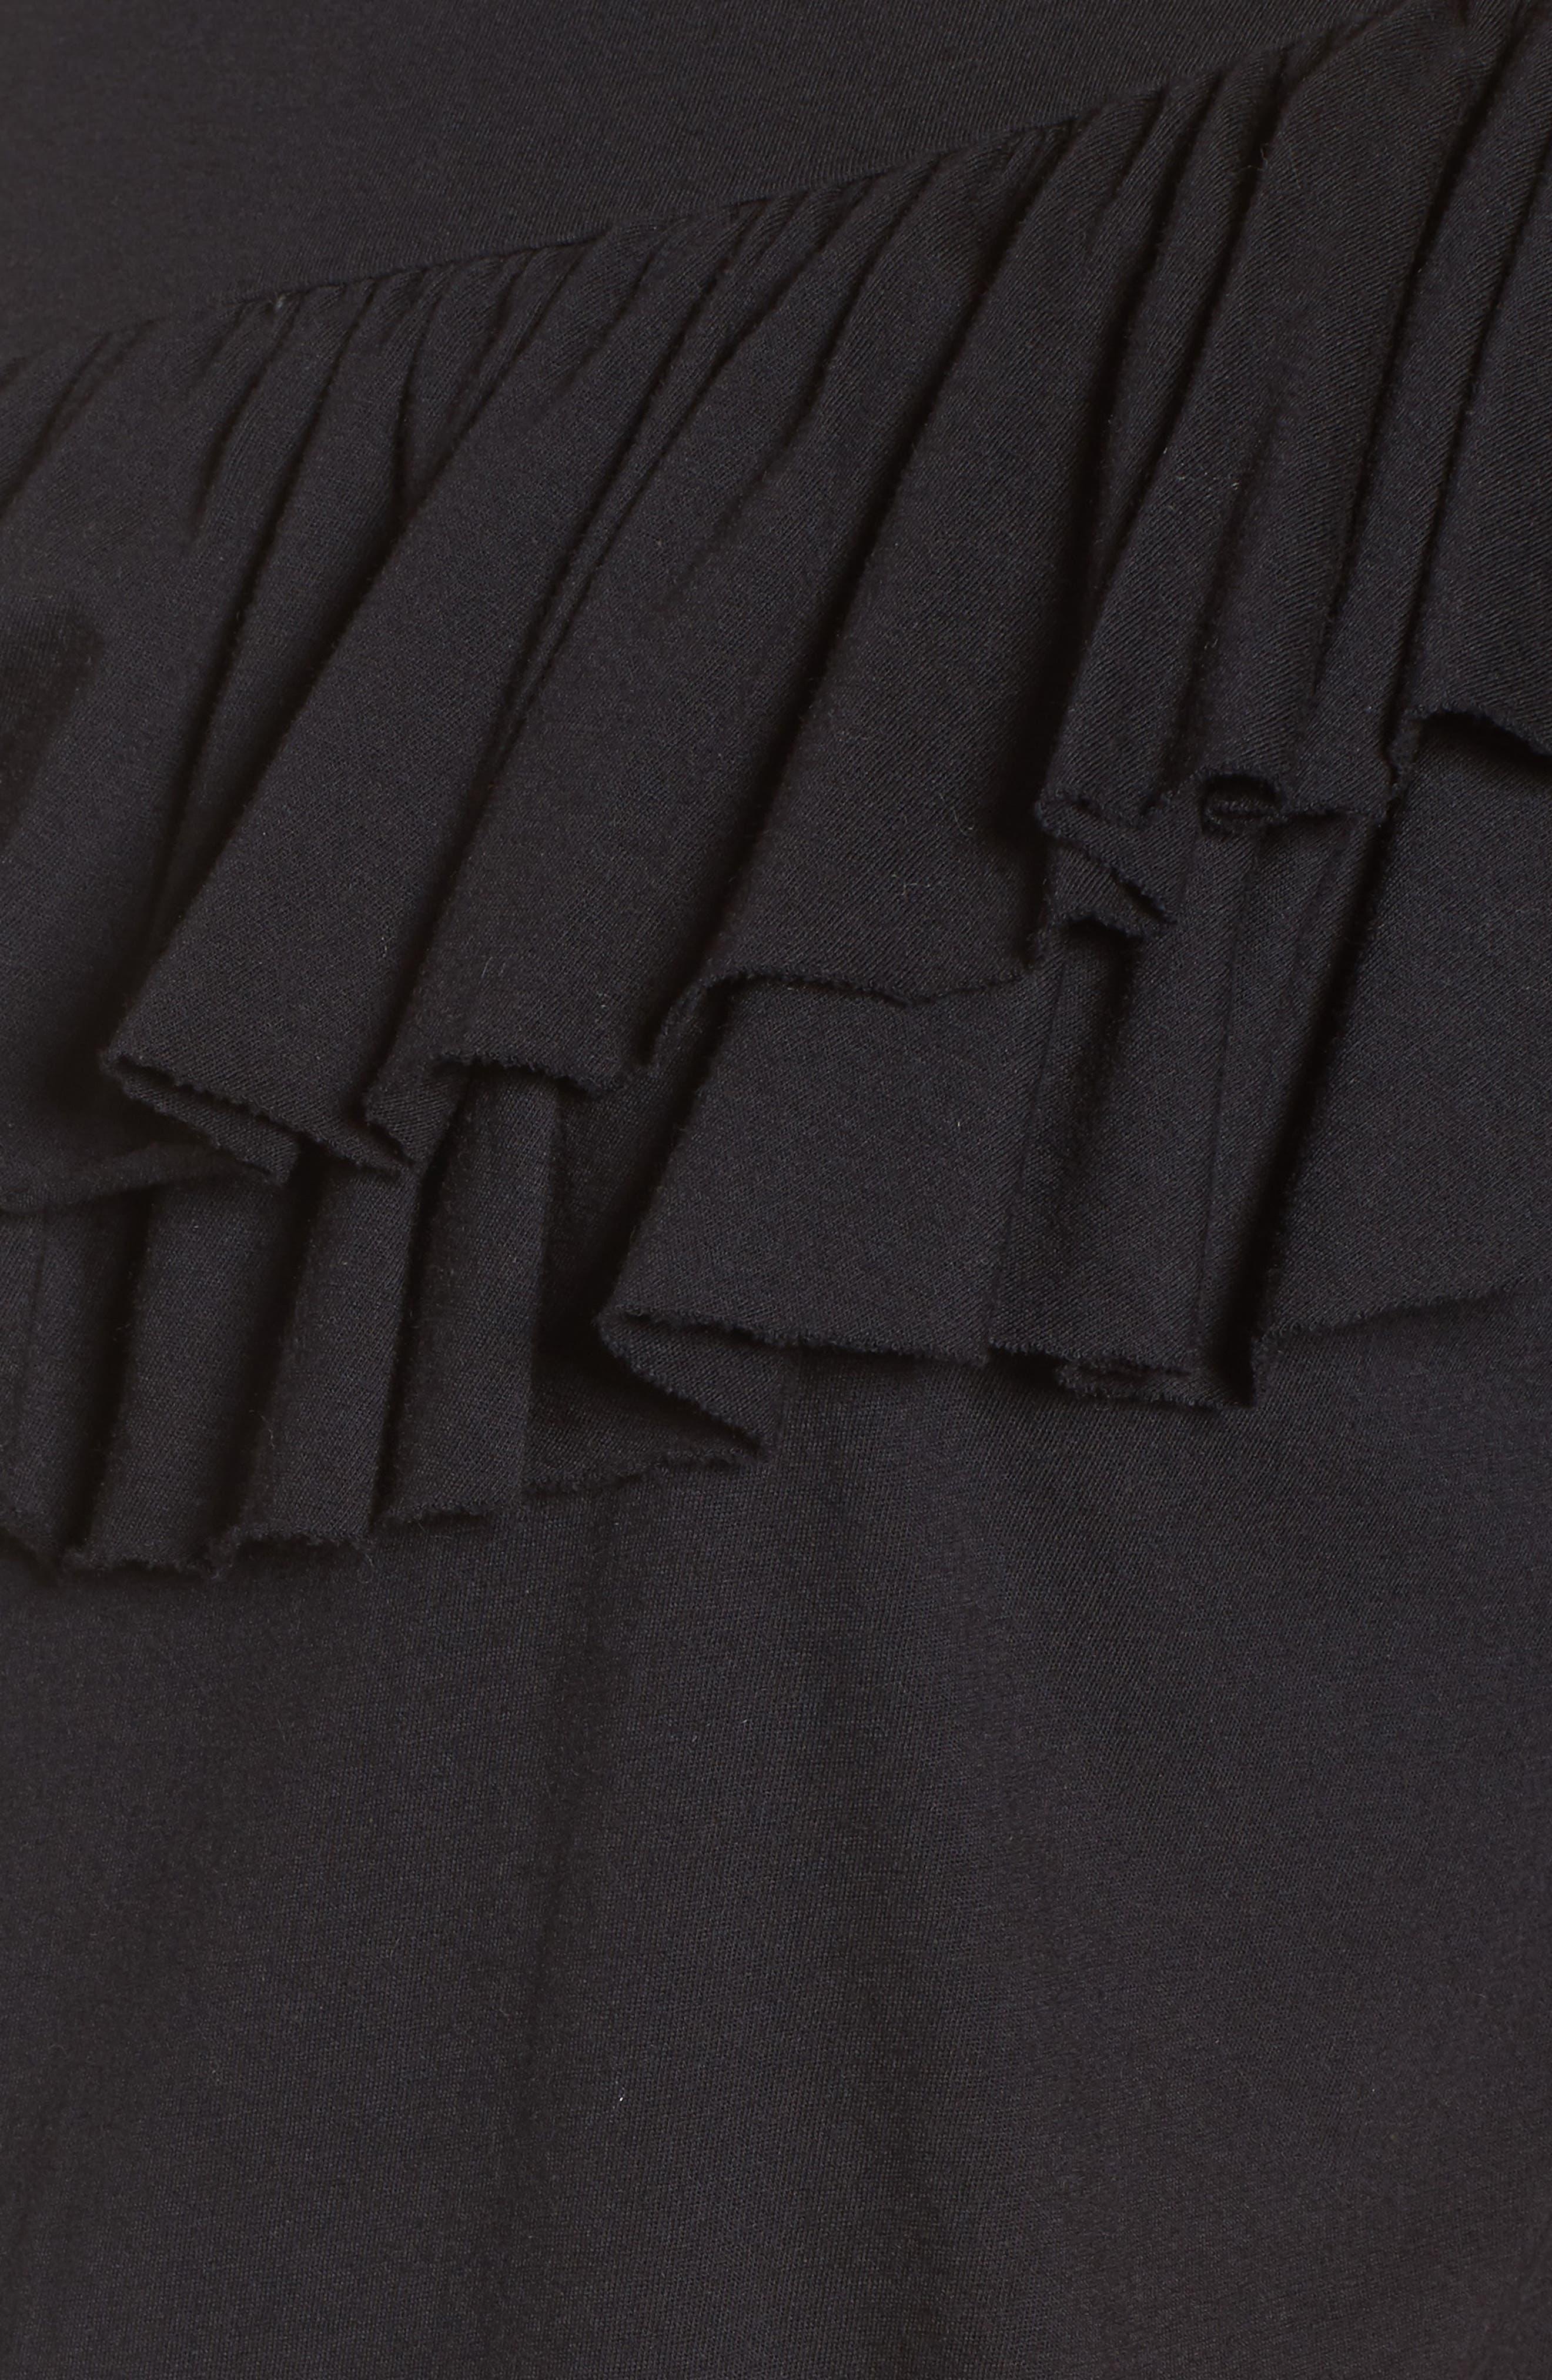 Asymmetrical Ruffle Tee,                             Alternate thumbnail 5, color,                             Black